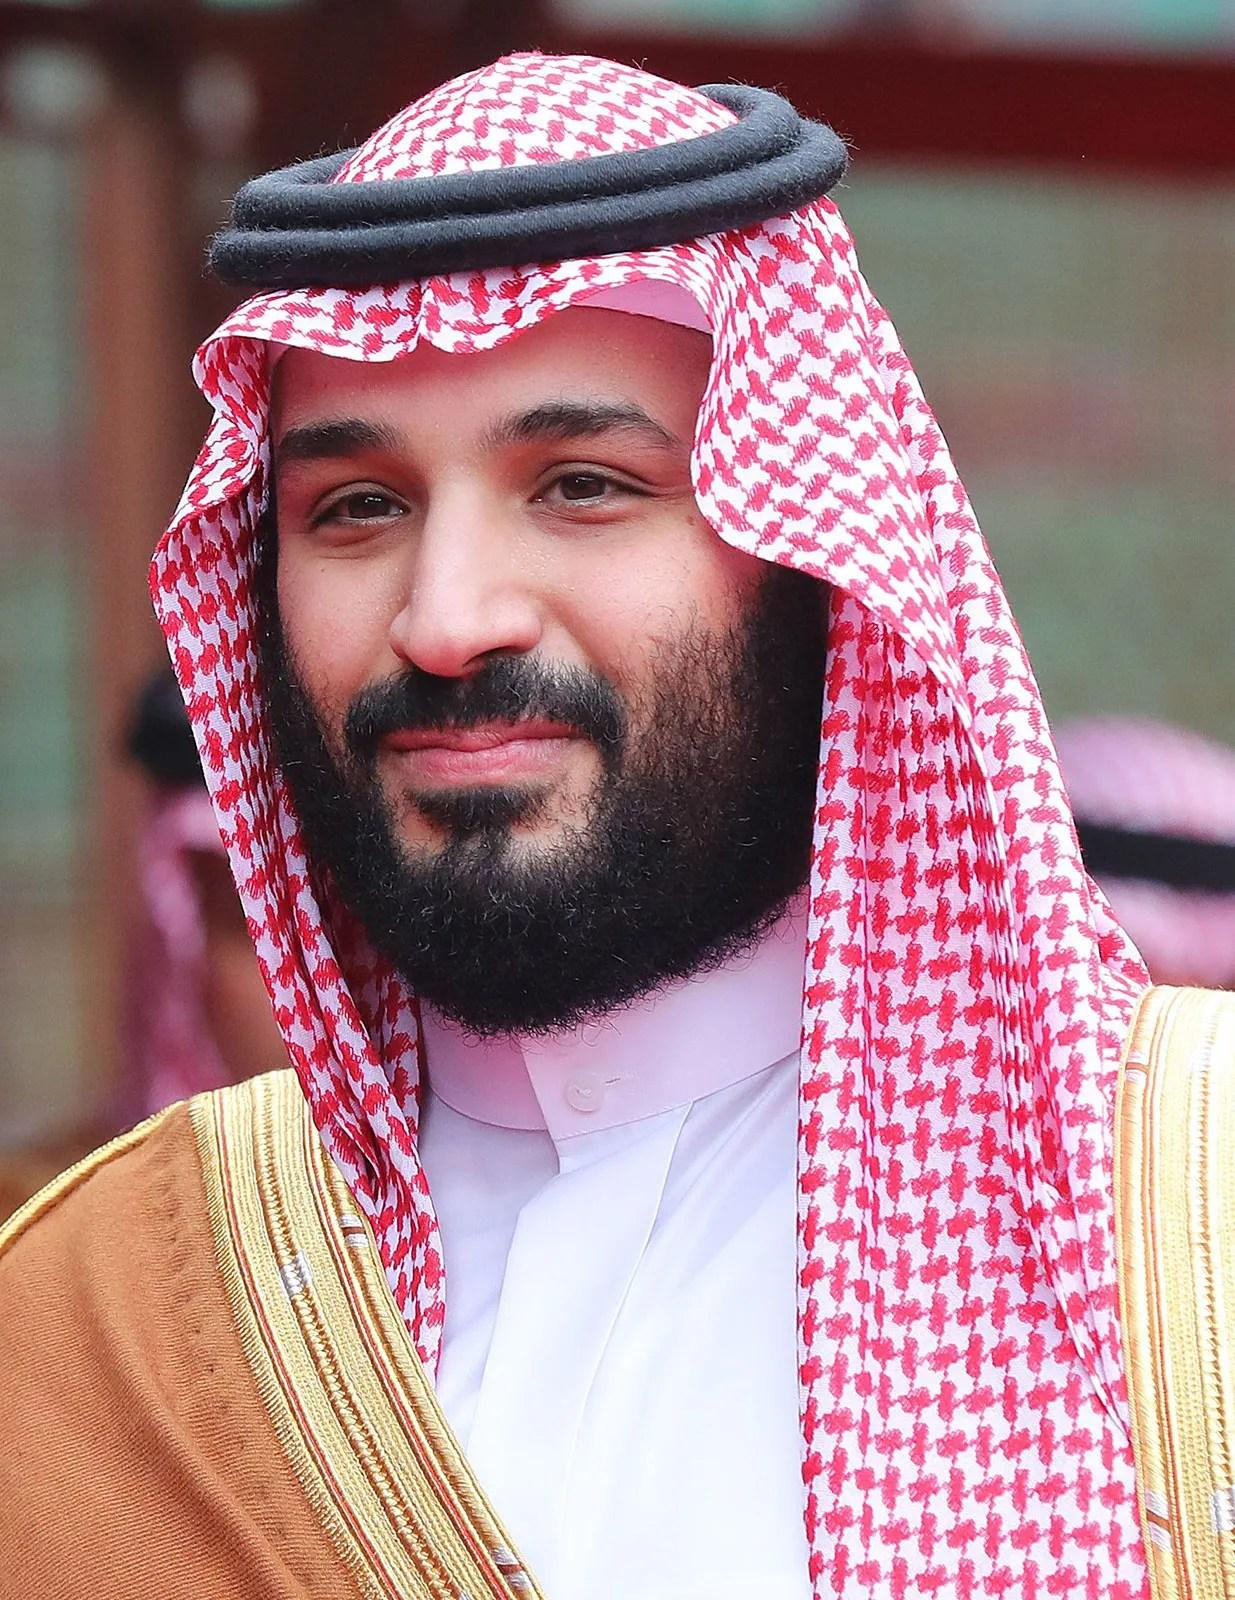 Berita pangeran mohammed bin salman arab saudi berencana menggandakan asetnya dalam lima tahun ke depan menjadi us$1,07 triliun atau setara dengan rp15.066. Mohammed bin Salman | Biography, Education, & Facts ...